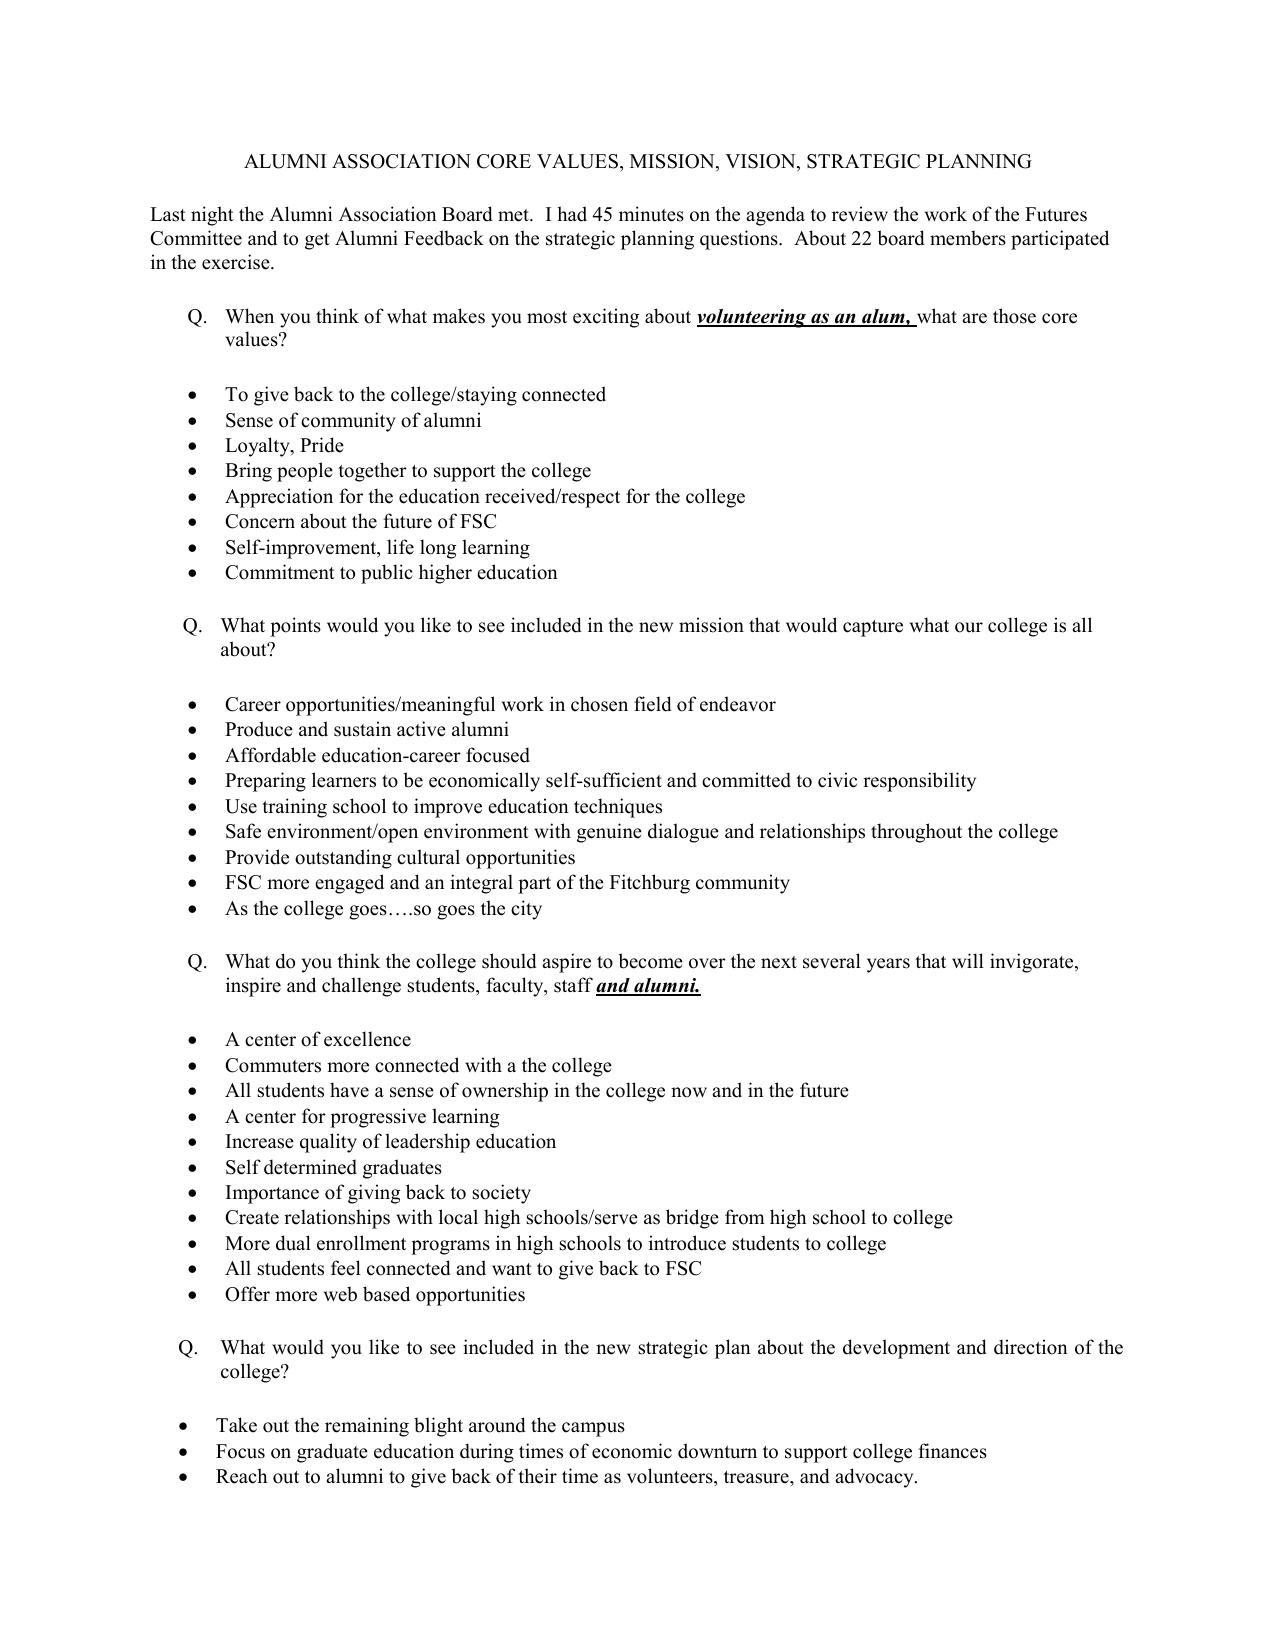 Alumni Association Core Values, Mission, Vision & Strategic